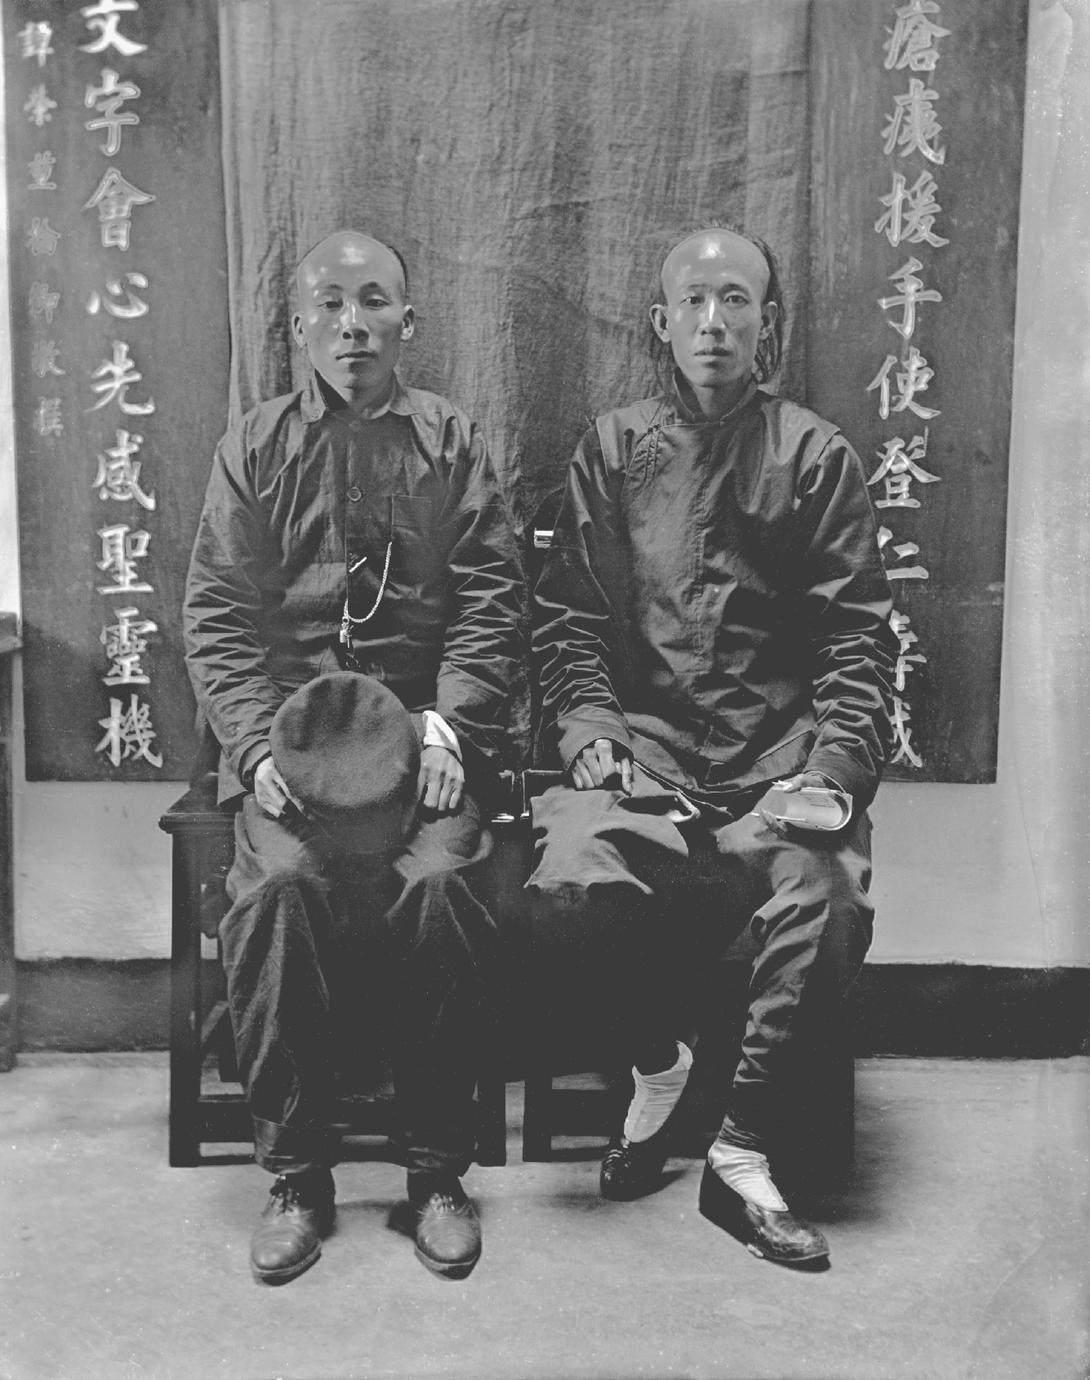 [Portrait of two men]